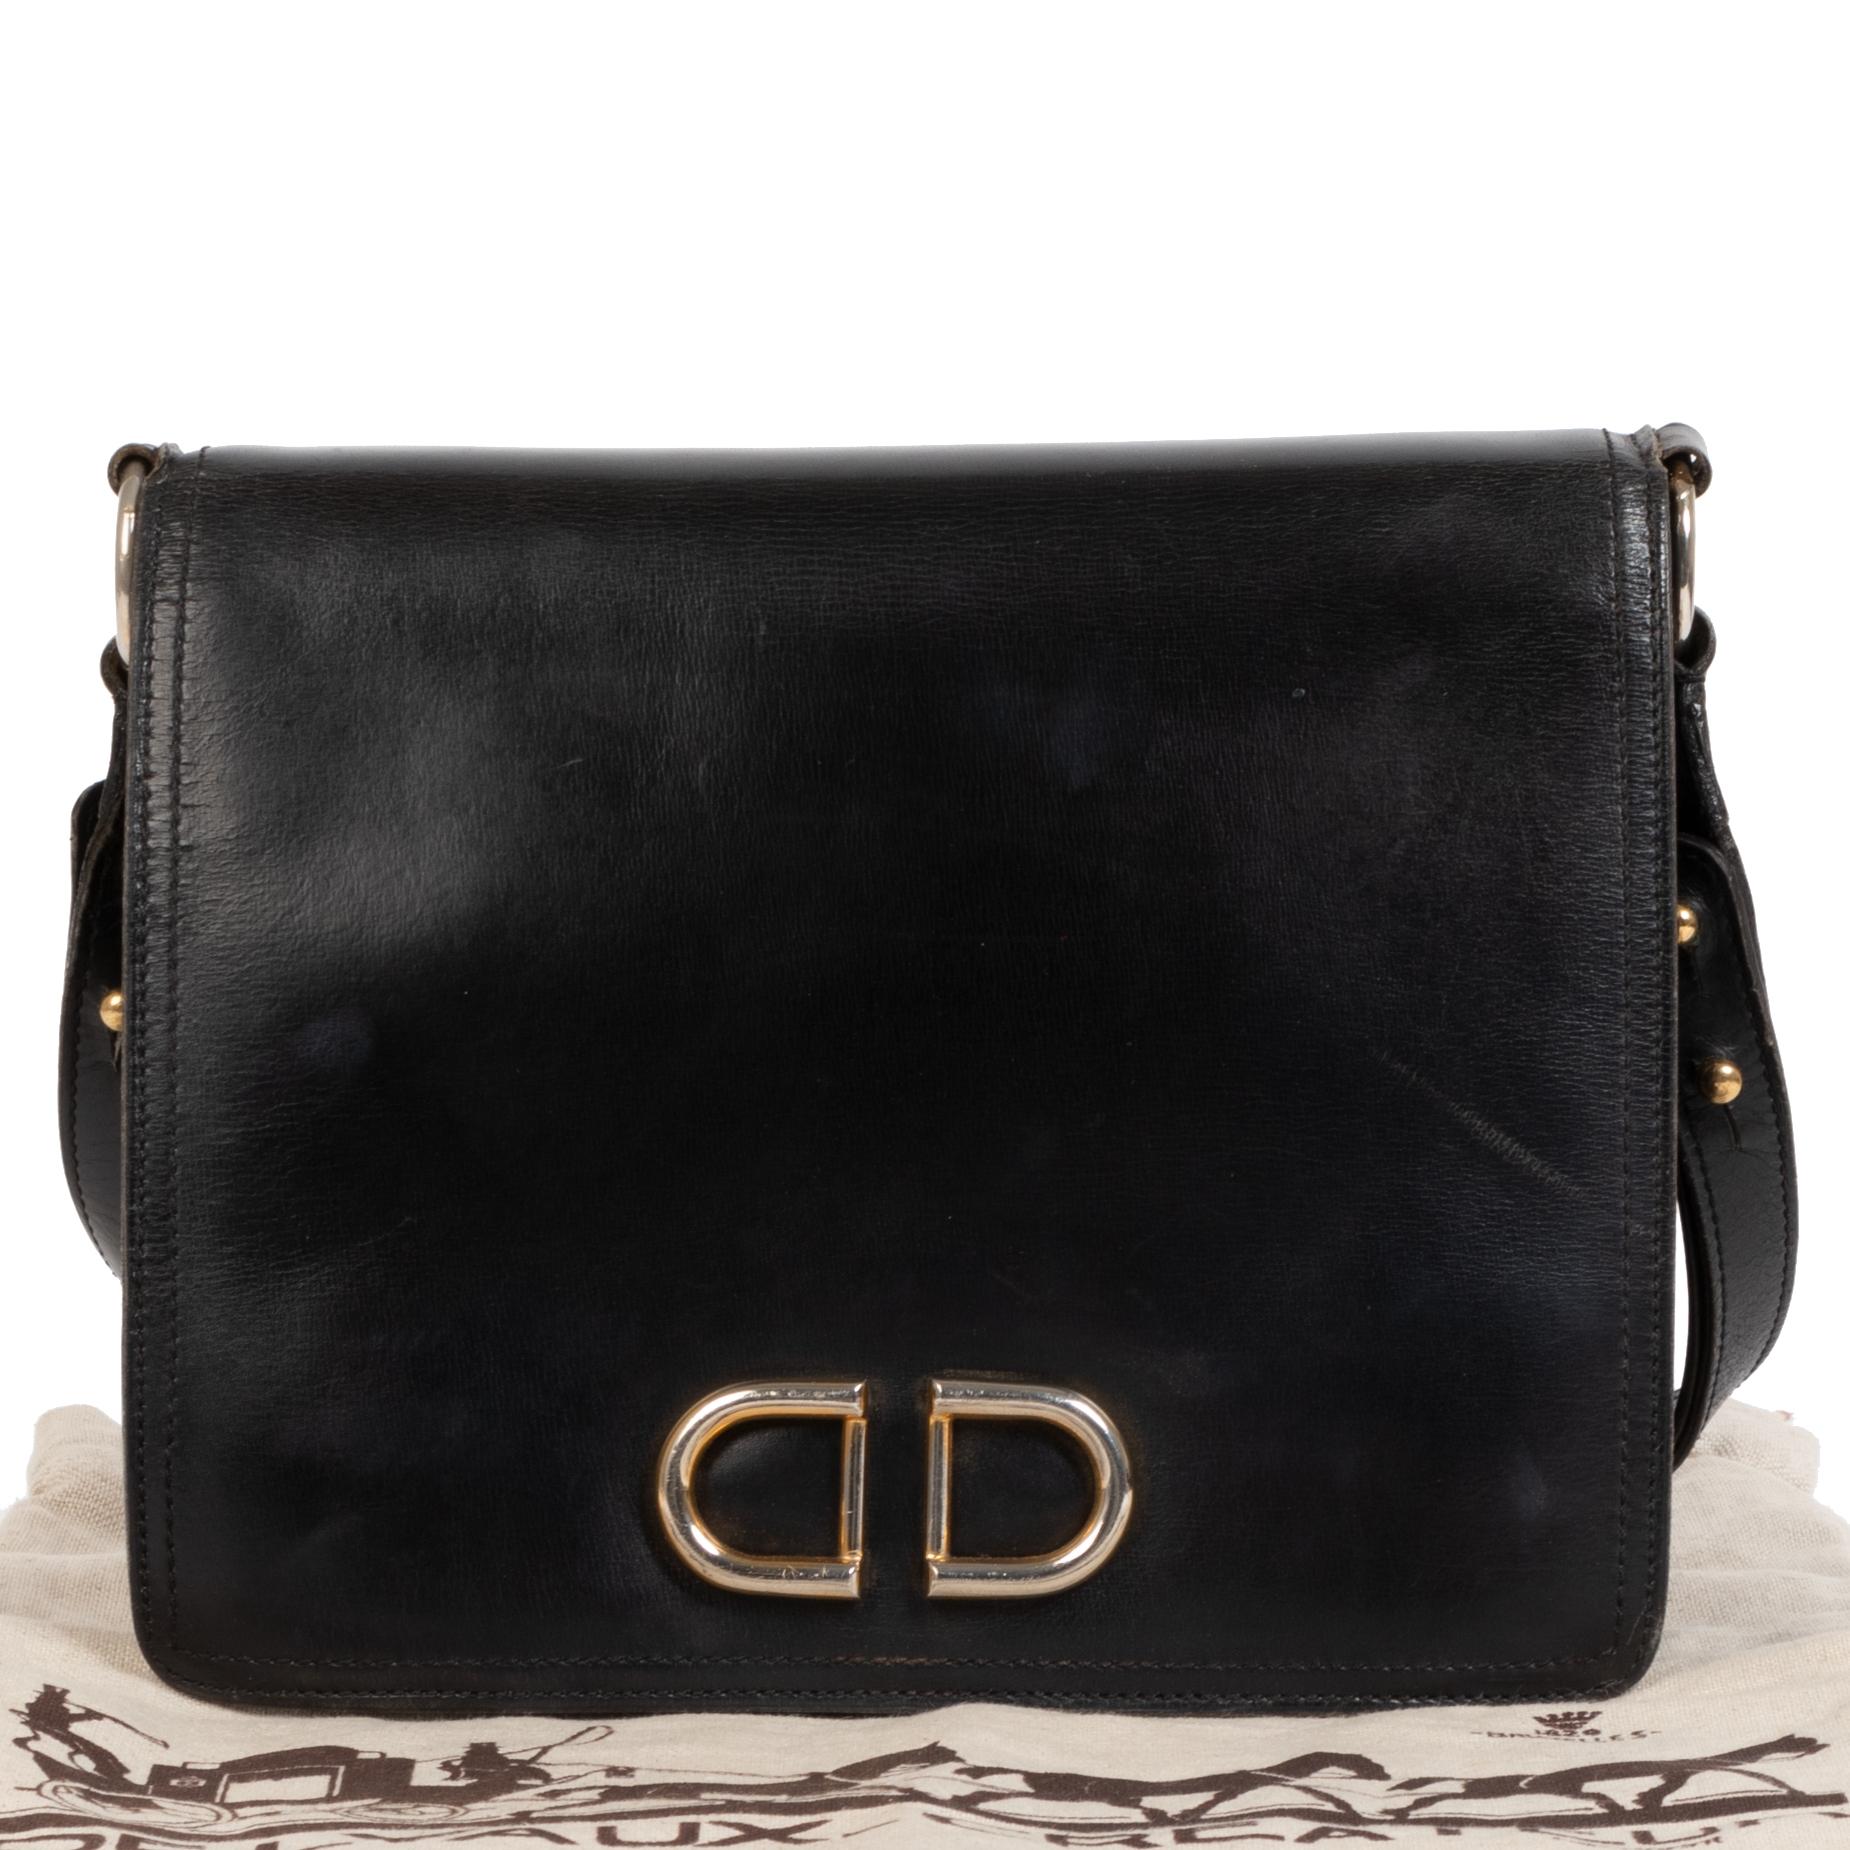 Delvaux Black Leather DD Shoulder Bag Delvaux Black Leather DD Shoulder Bag